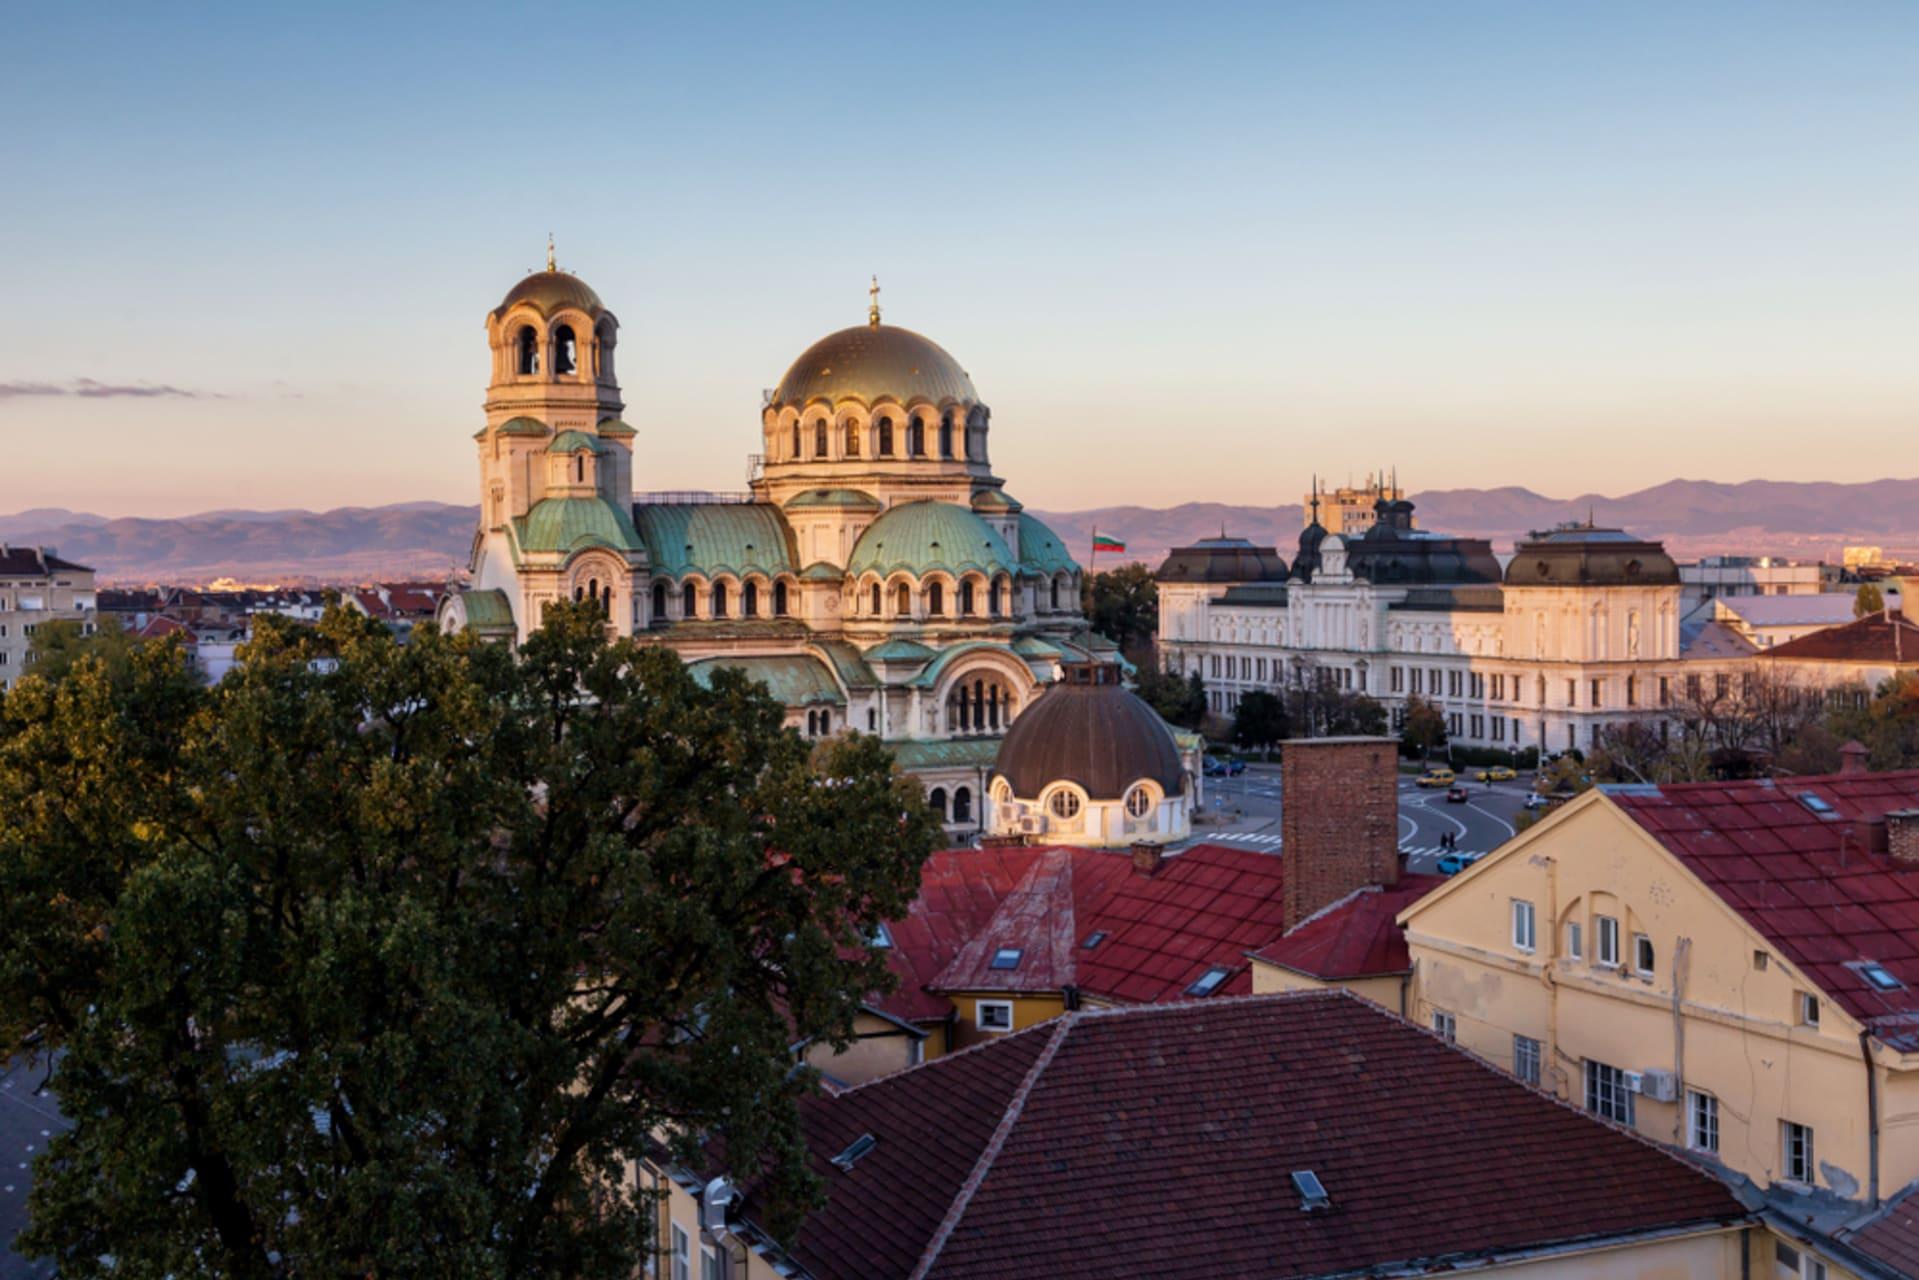 Sofia - The Beating Heart of Sofia